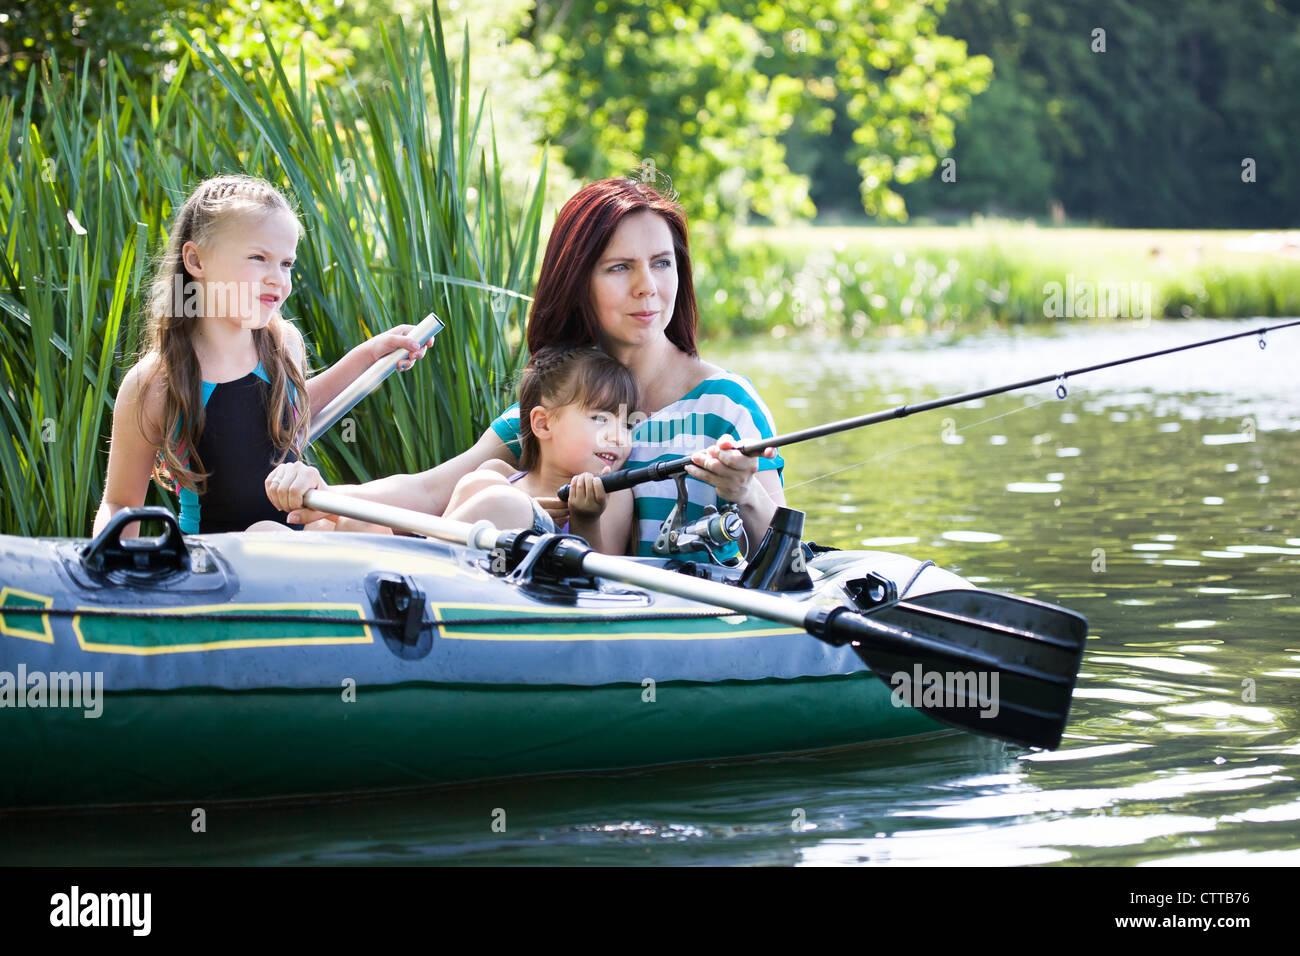 family fishing on lake at summer - Stock Image